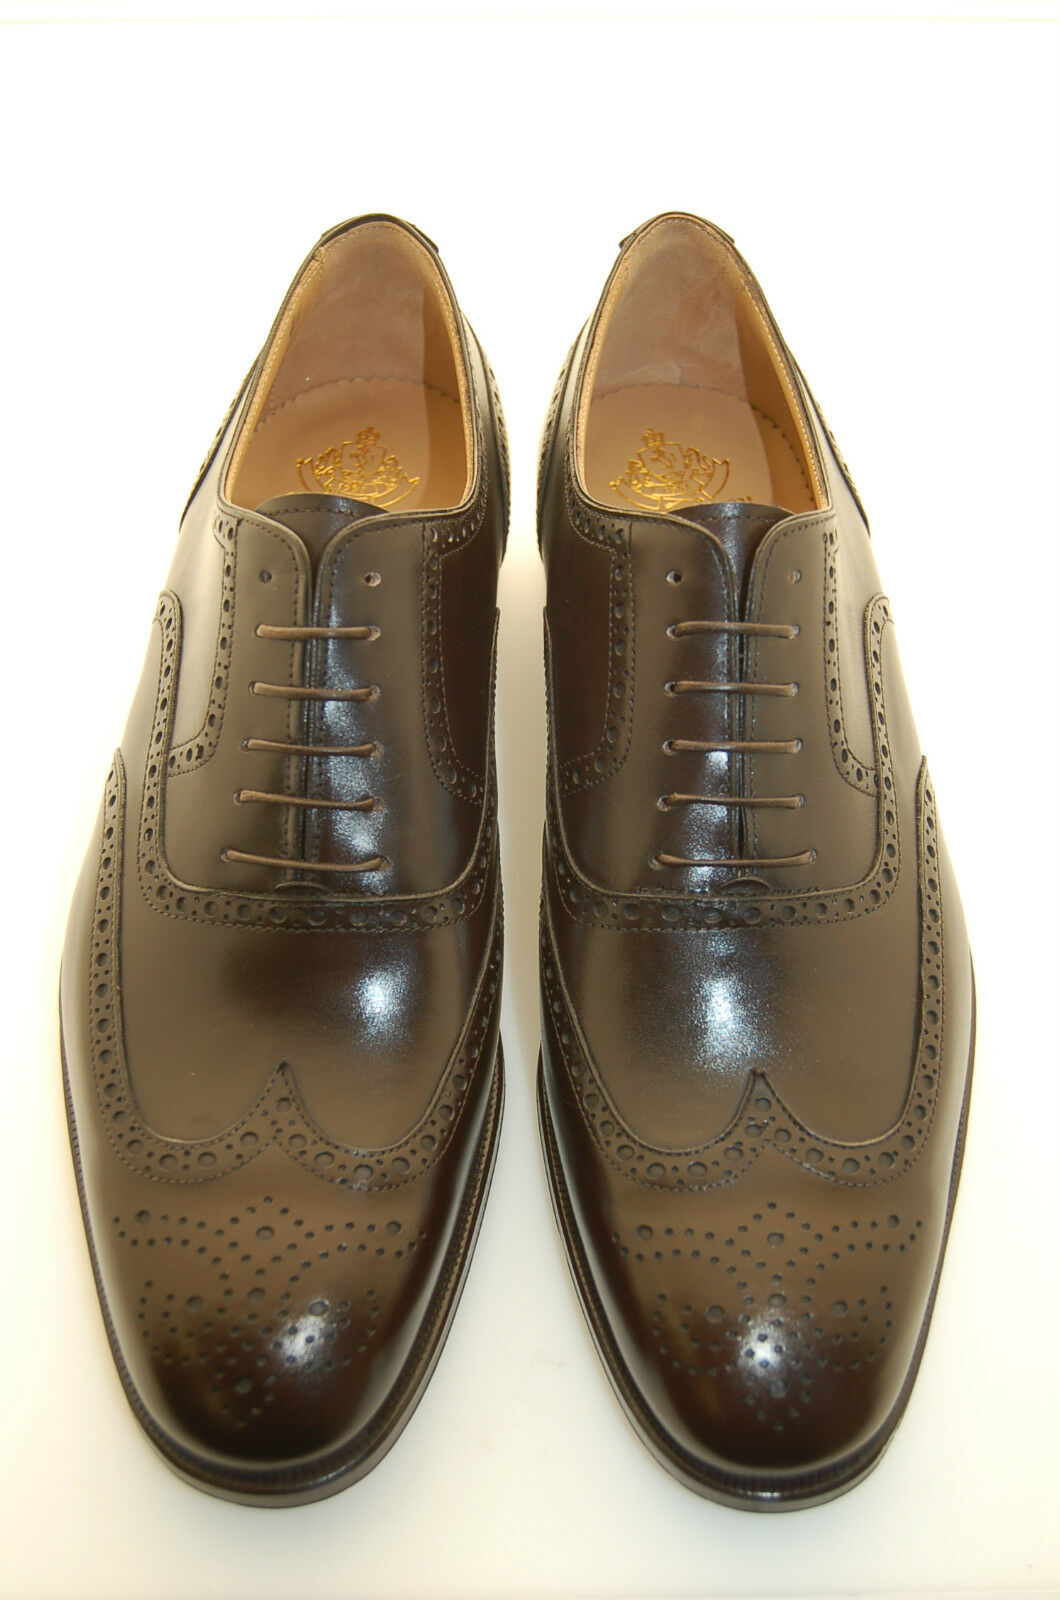 MAN OXFORD WINGTIP - HEAD BROWN DOUBLE CALF - PERFS&MEDALLION - DOUBLE BROWN LTH SOLE-BLAKE 7e2fe5